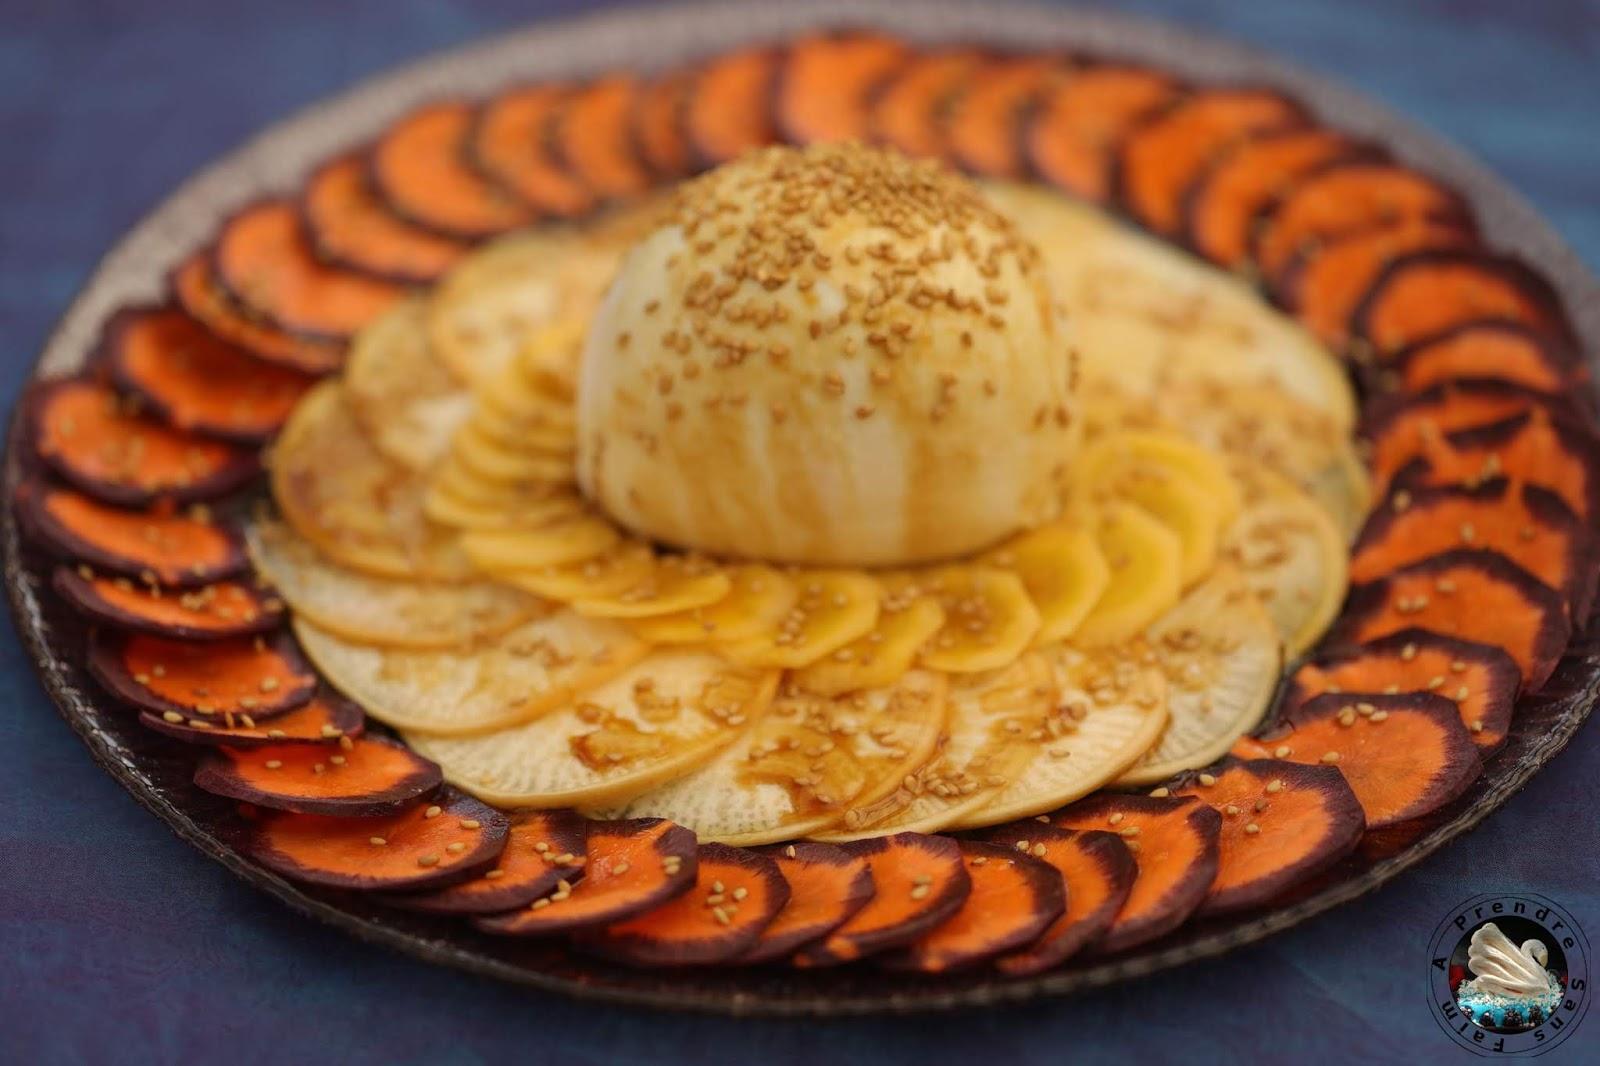 Carpaccio navet carottes à la mozzarella di bufala campana